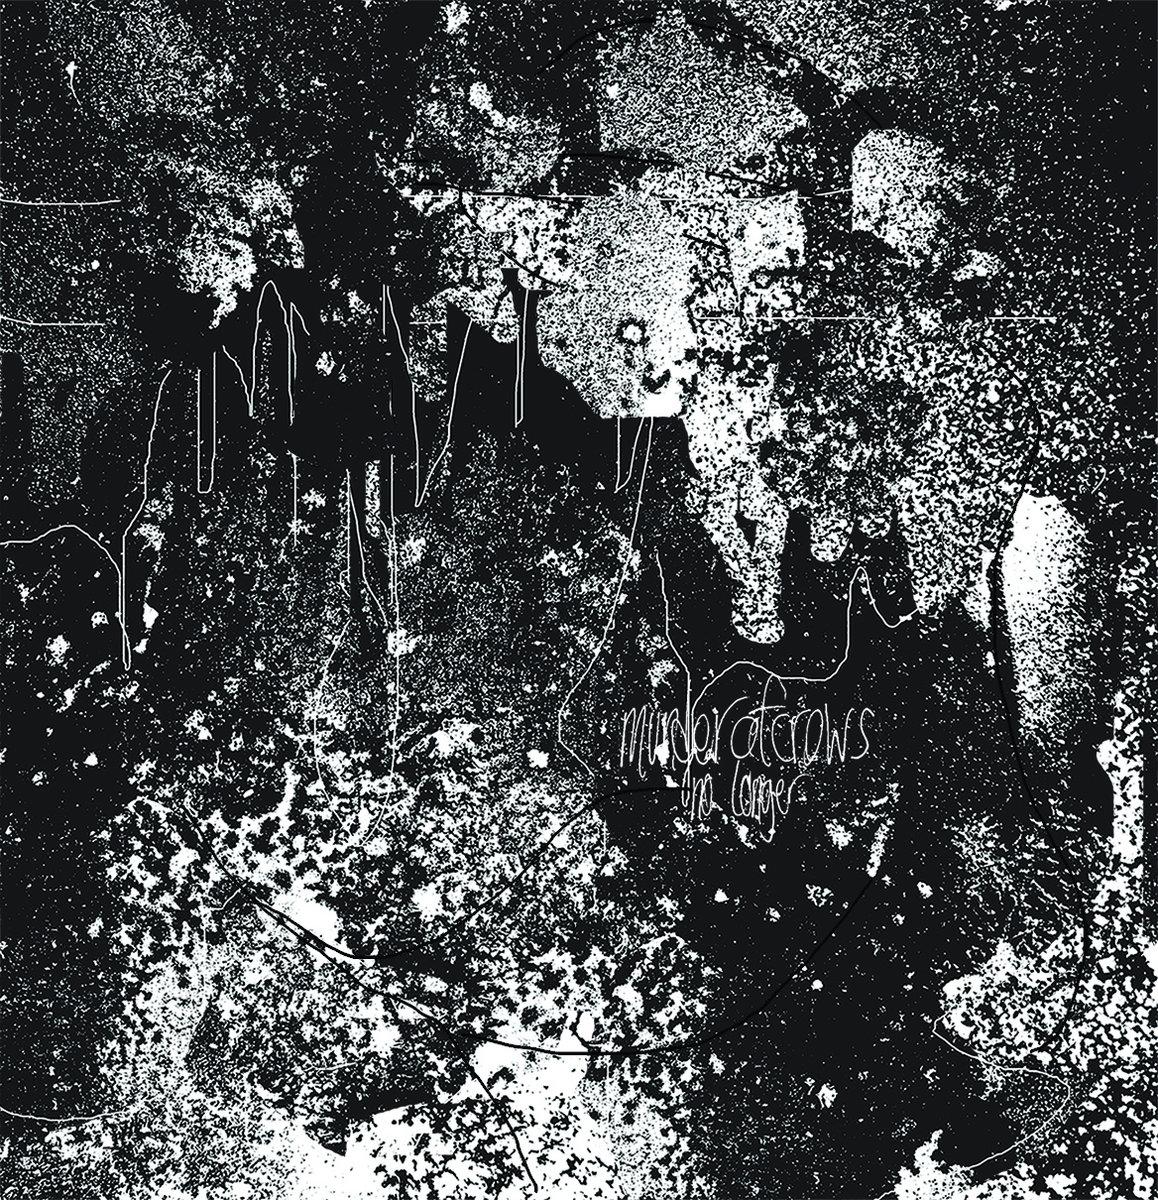 Murderofcrows - No Longer